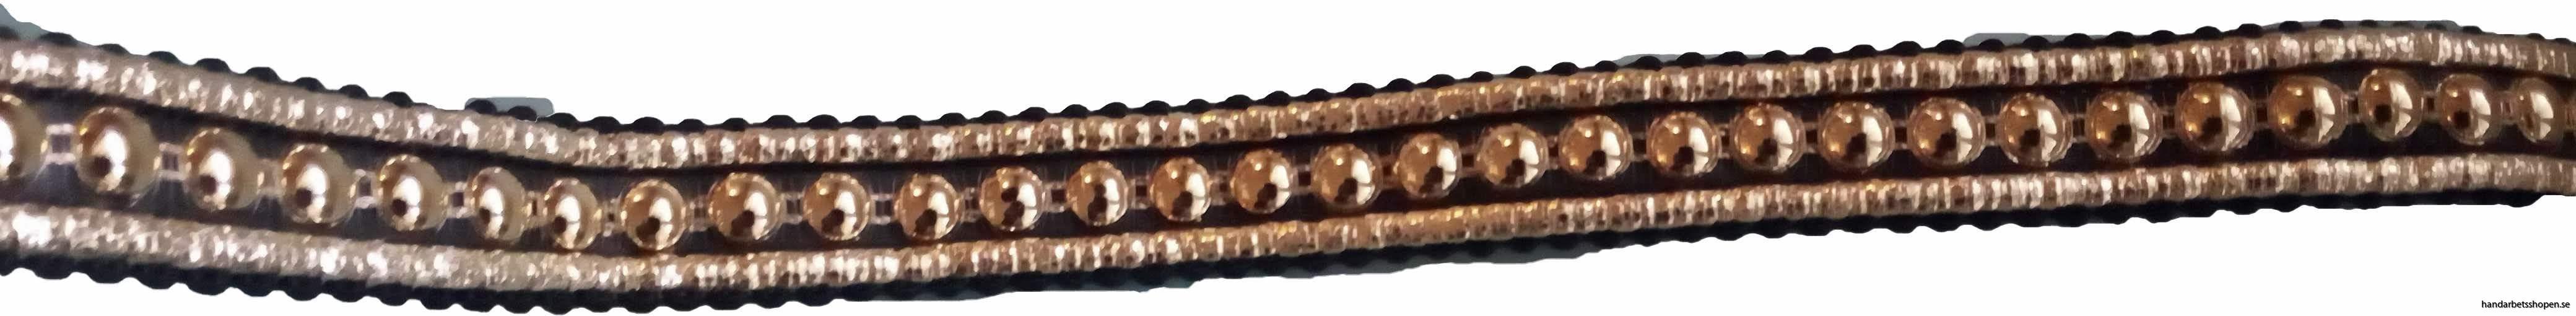 ST-11069-017-103